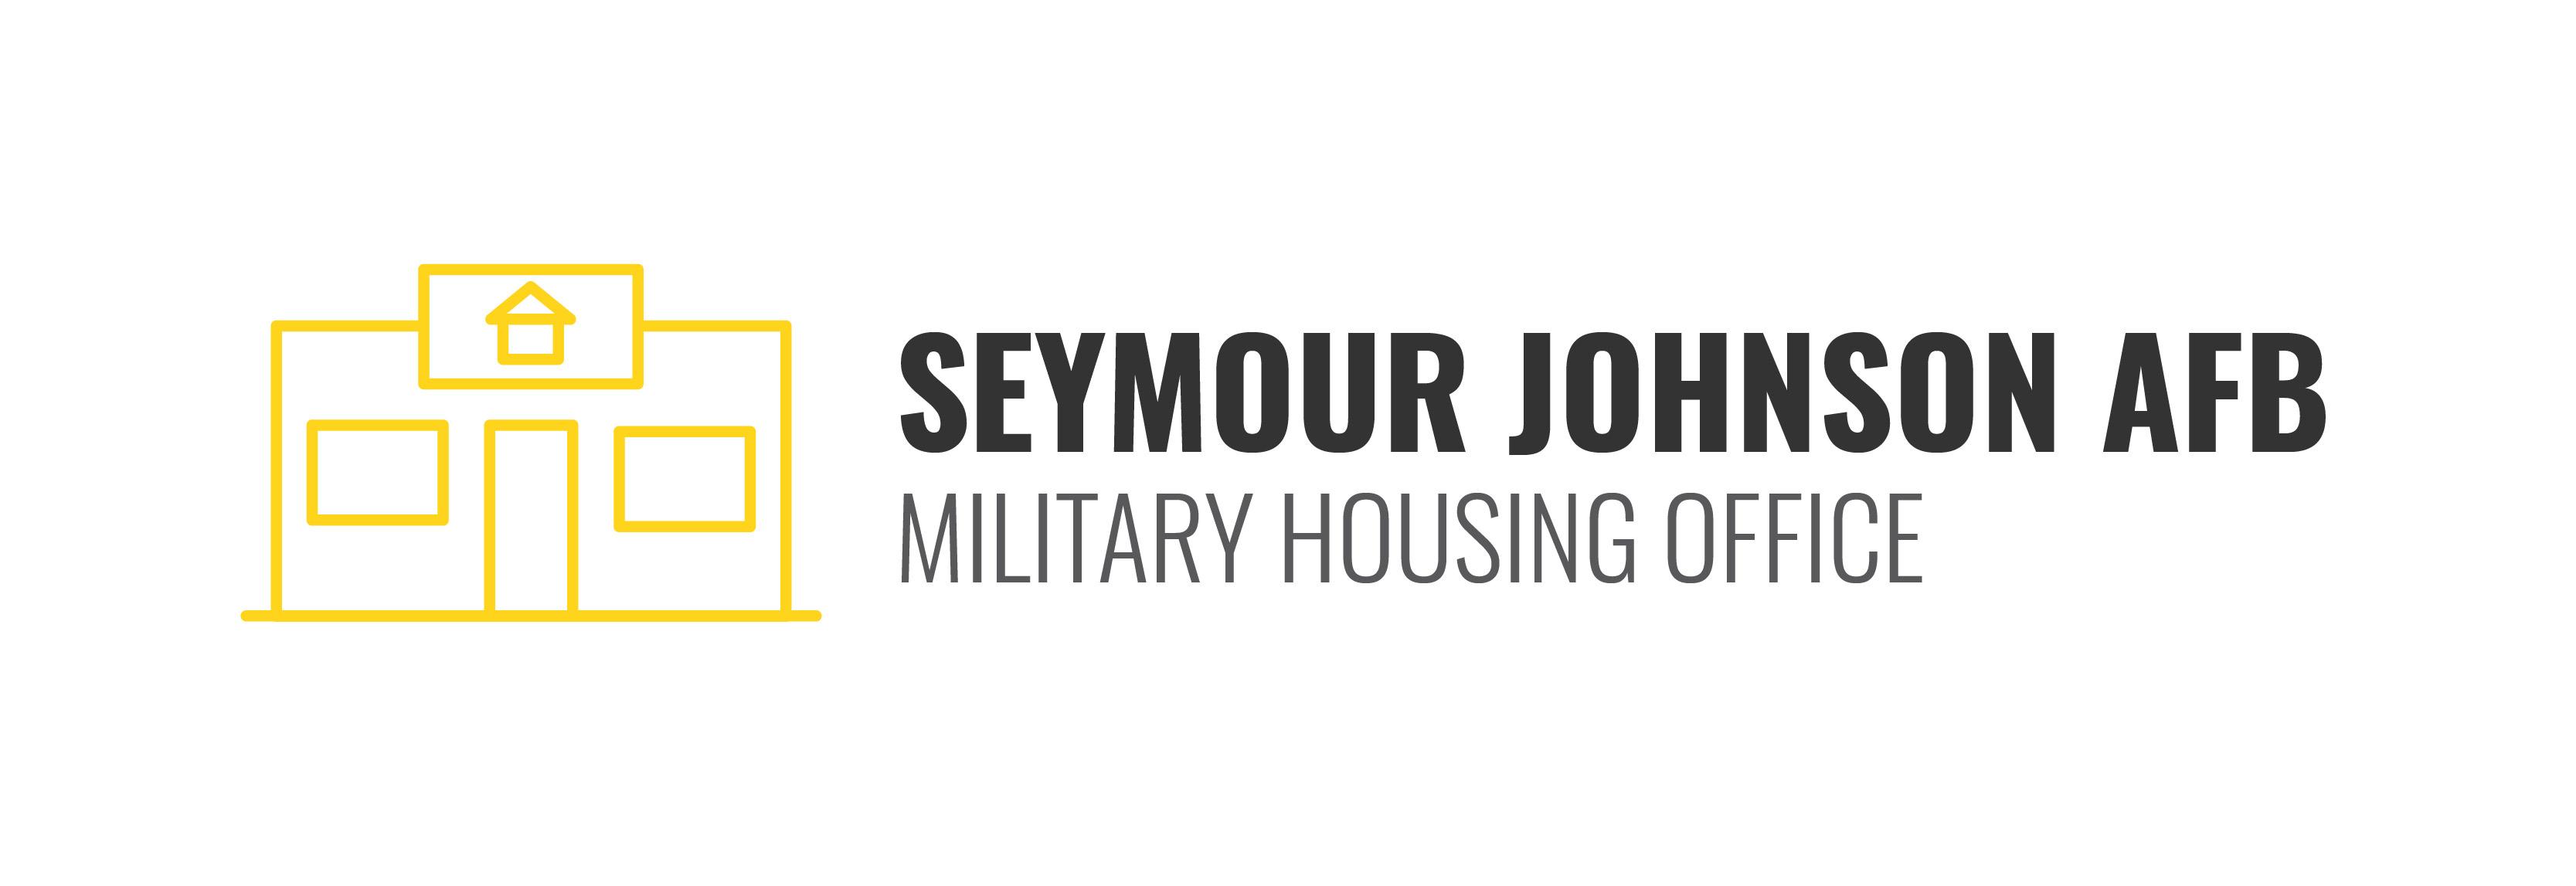 Seymour Johnson AFB Military Housing Office